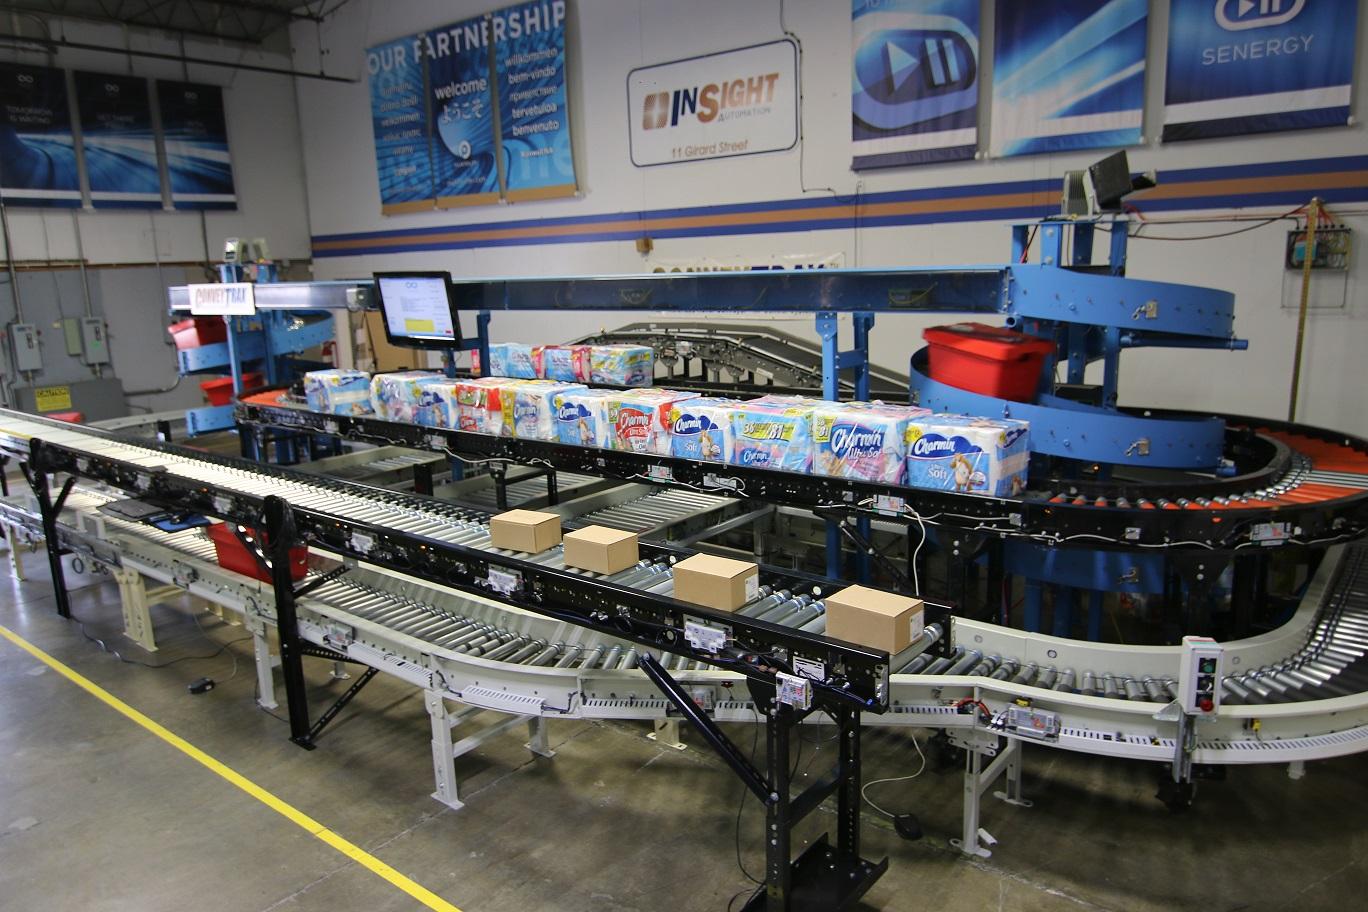 Insight Automation Conveyor Systems